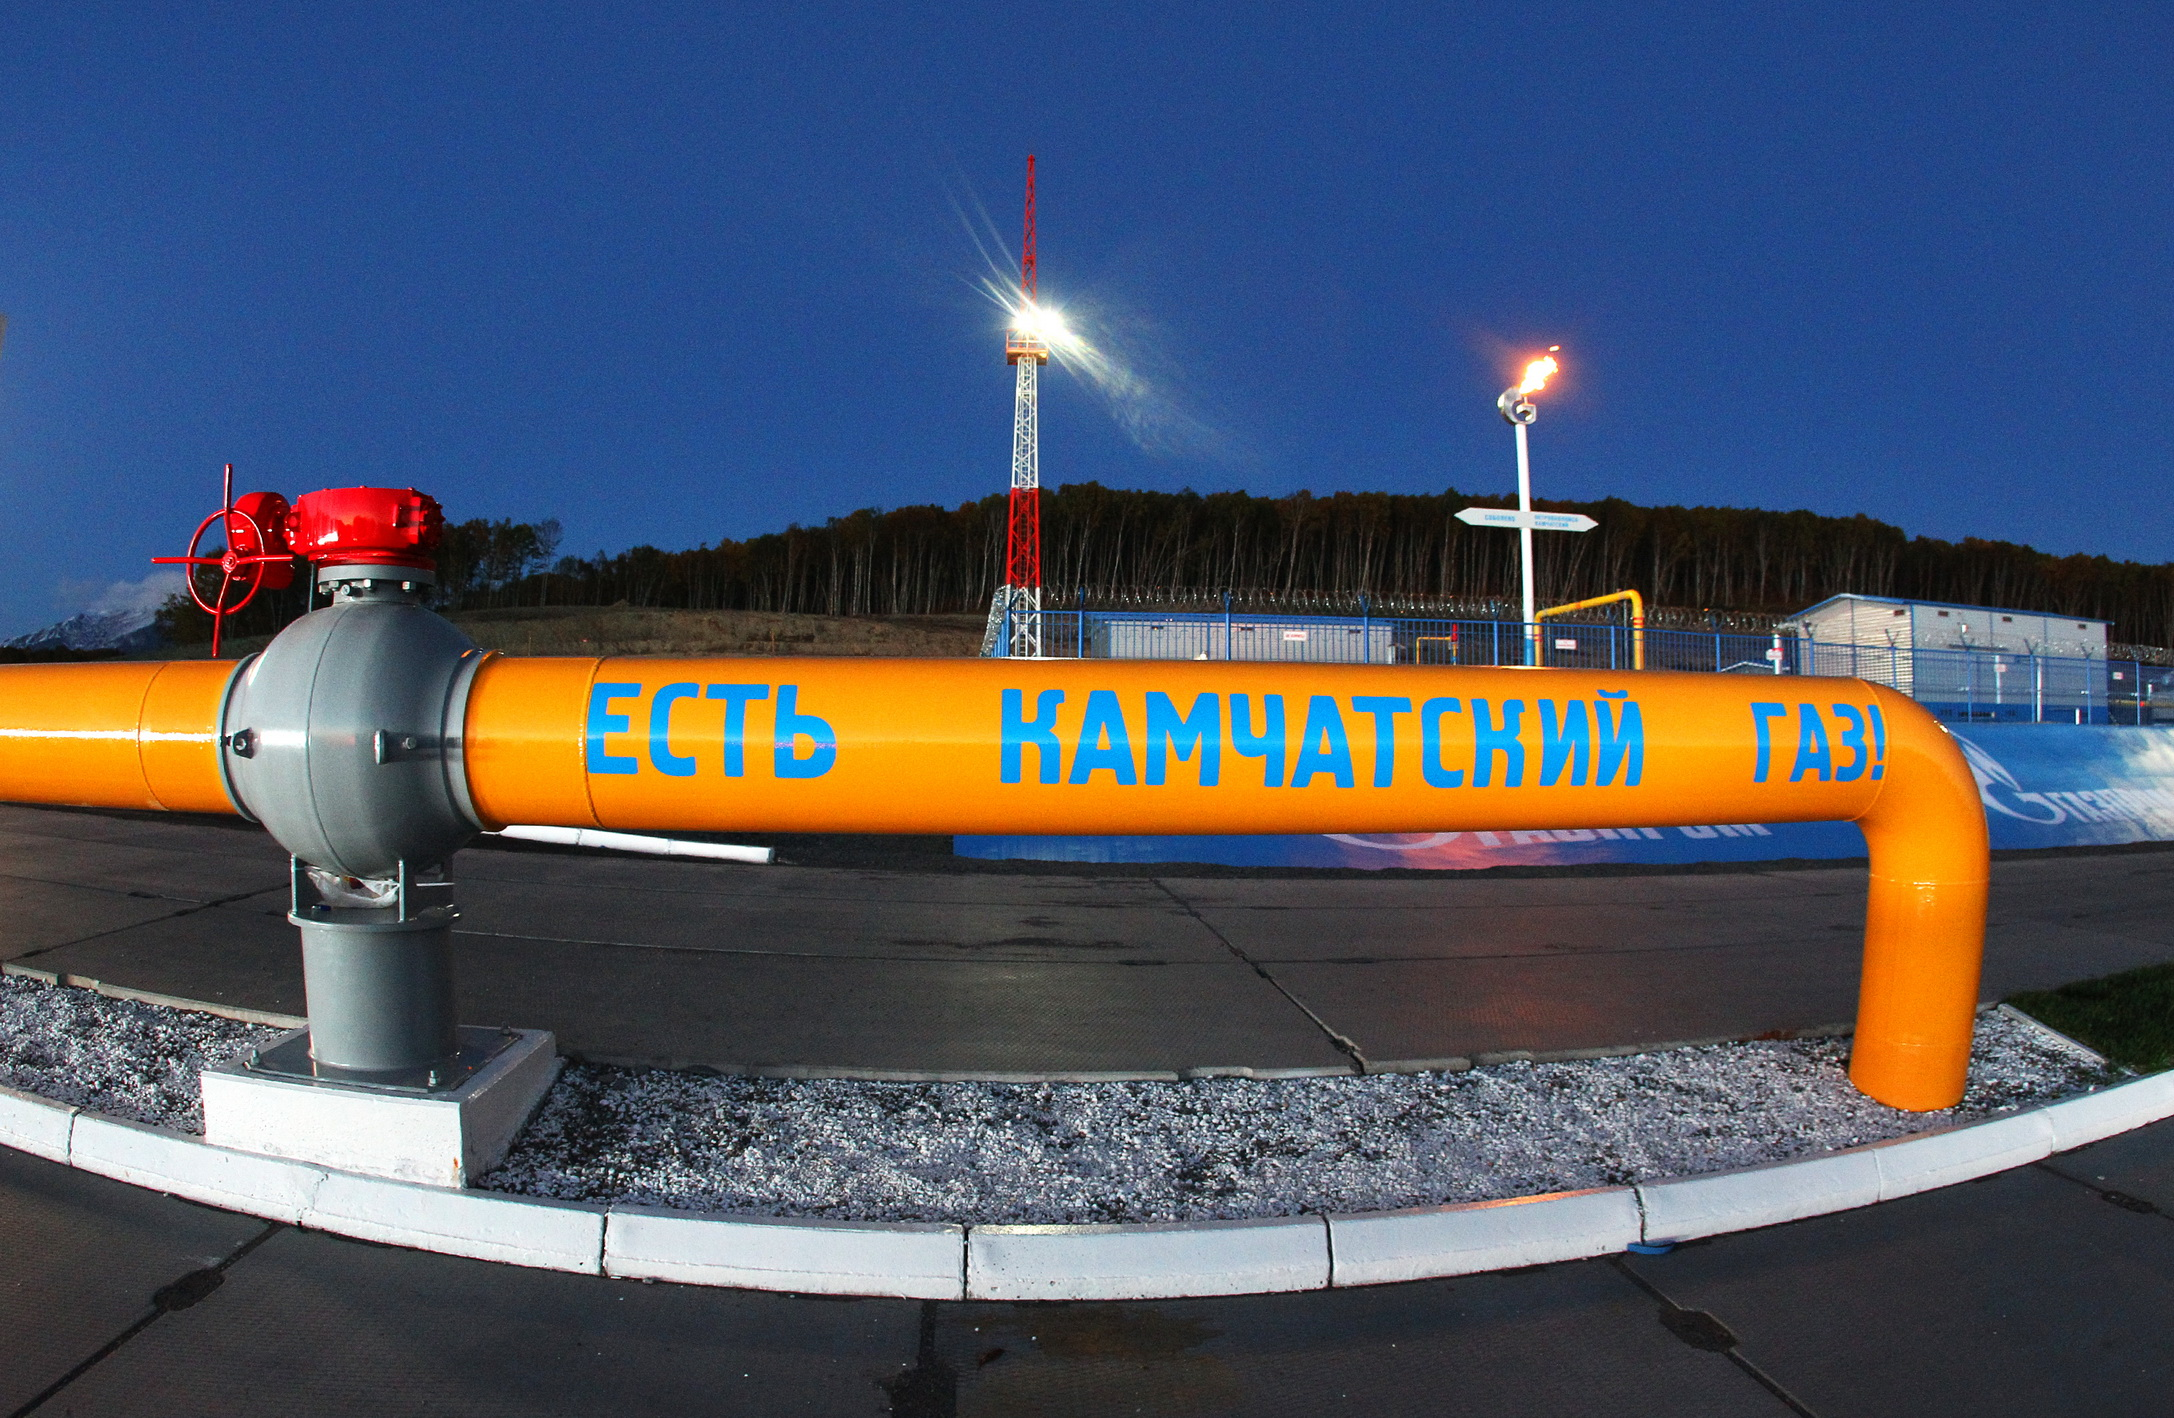 "<p>Фото © <a href=""https://www.gazprom.ru/press/news/2010/september/article103557/"" target=""_blank"" rel=""noopener noreferrer"">gazprom.ru</a></p>"